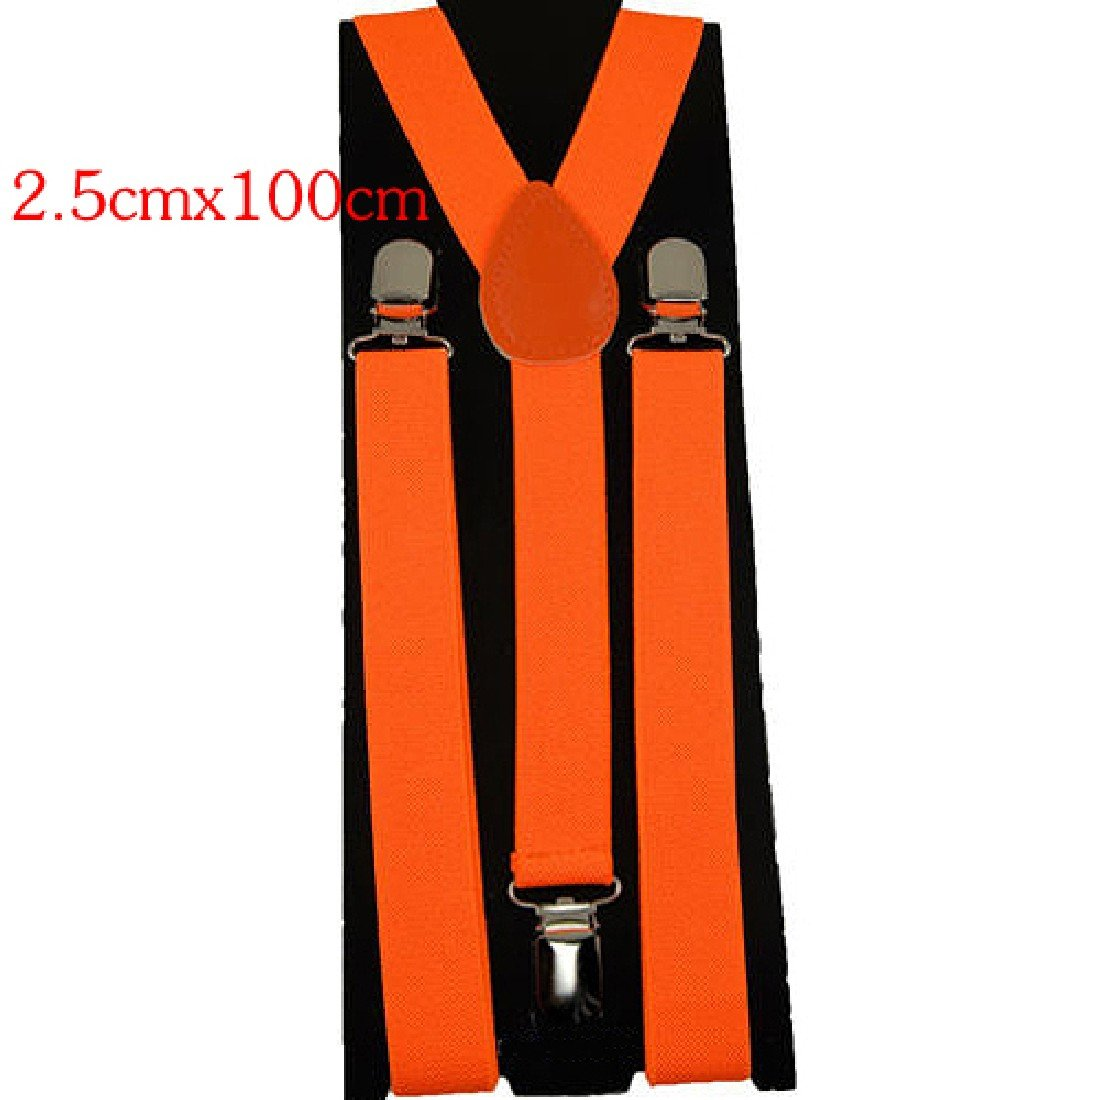 Joylive 2.5*100cm Men Womens Clip-on Suspenders Elastic Y-Shape Adjustable Braces Solids